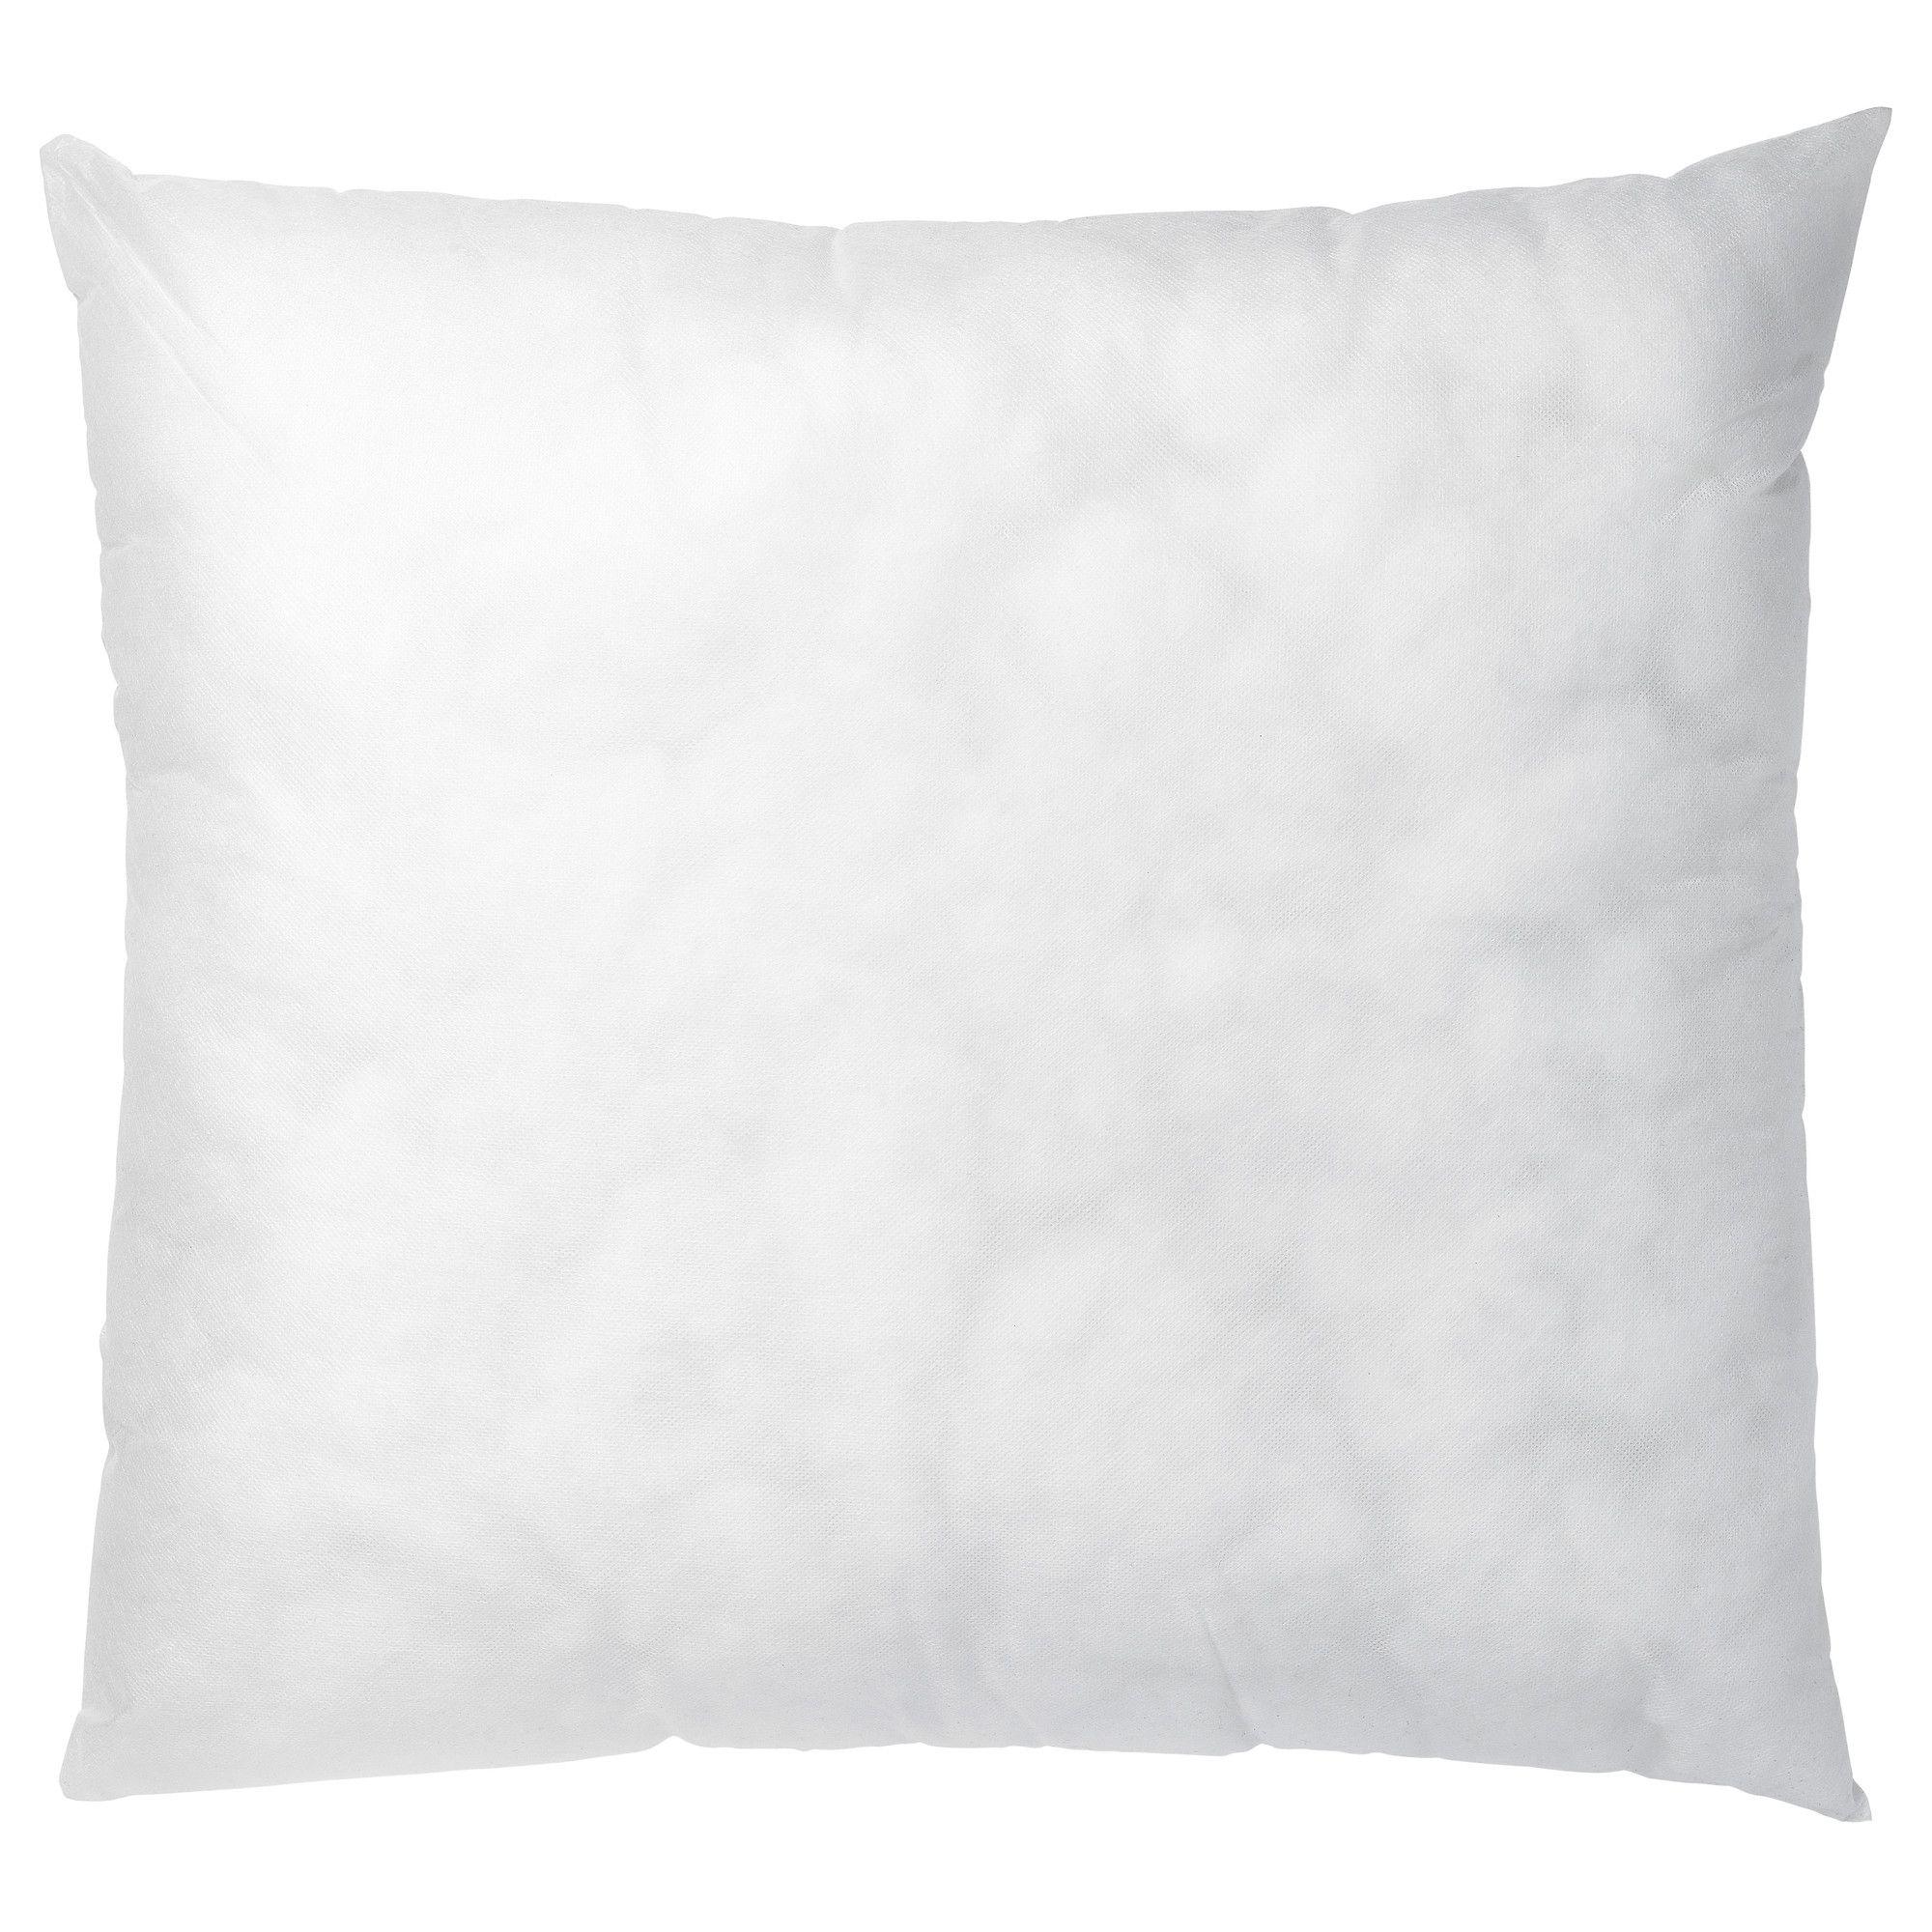 inner coussin recouvrir blanc upholstery rembourrage tapissier garnisseur pinterest. Black Bedroom Furniture Sets. Home Design Ideas